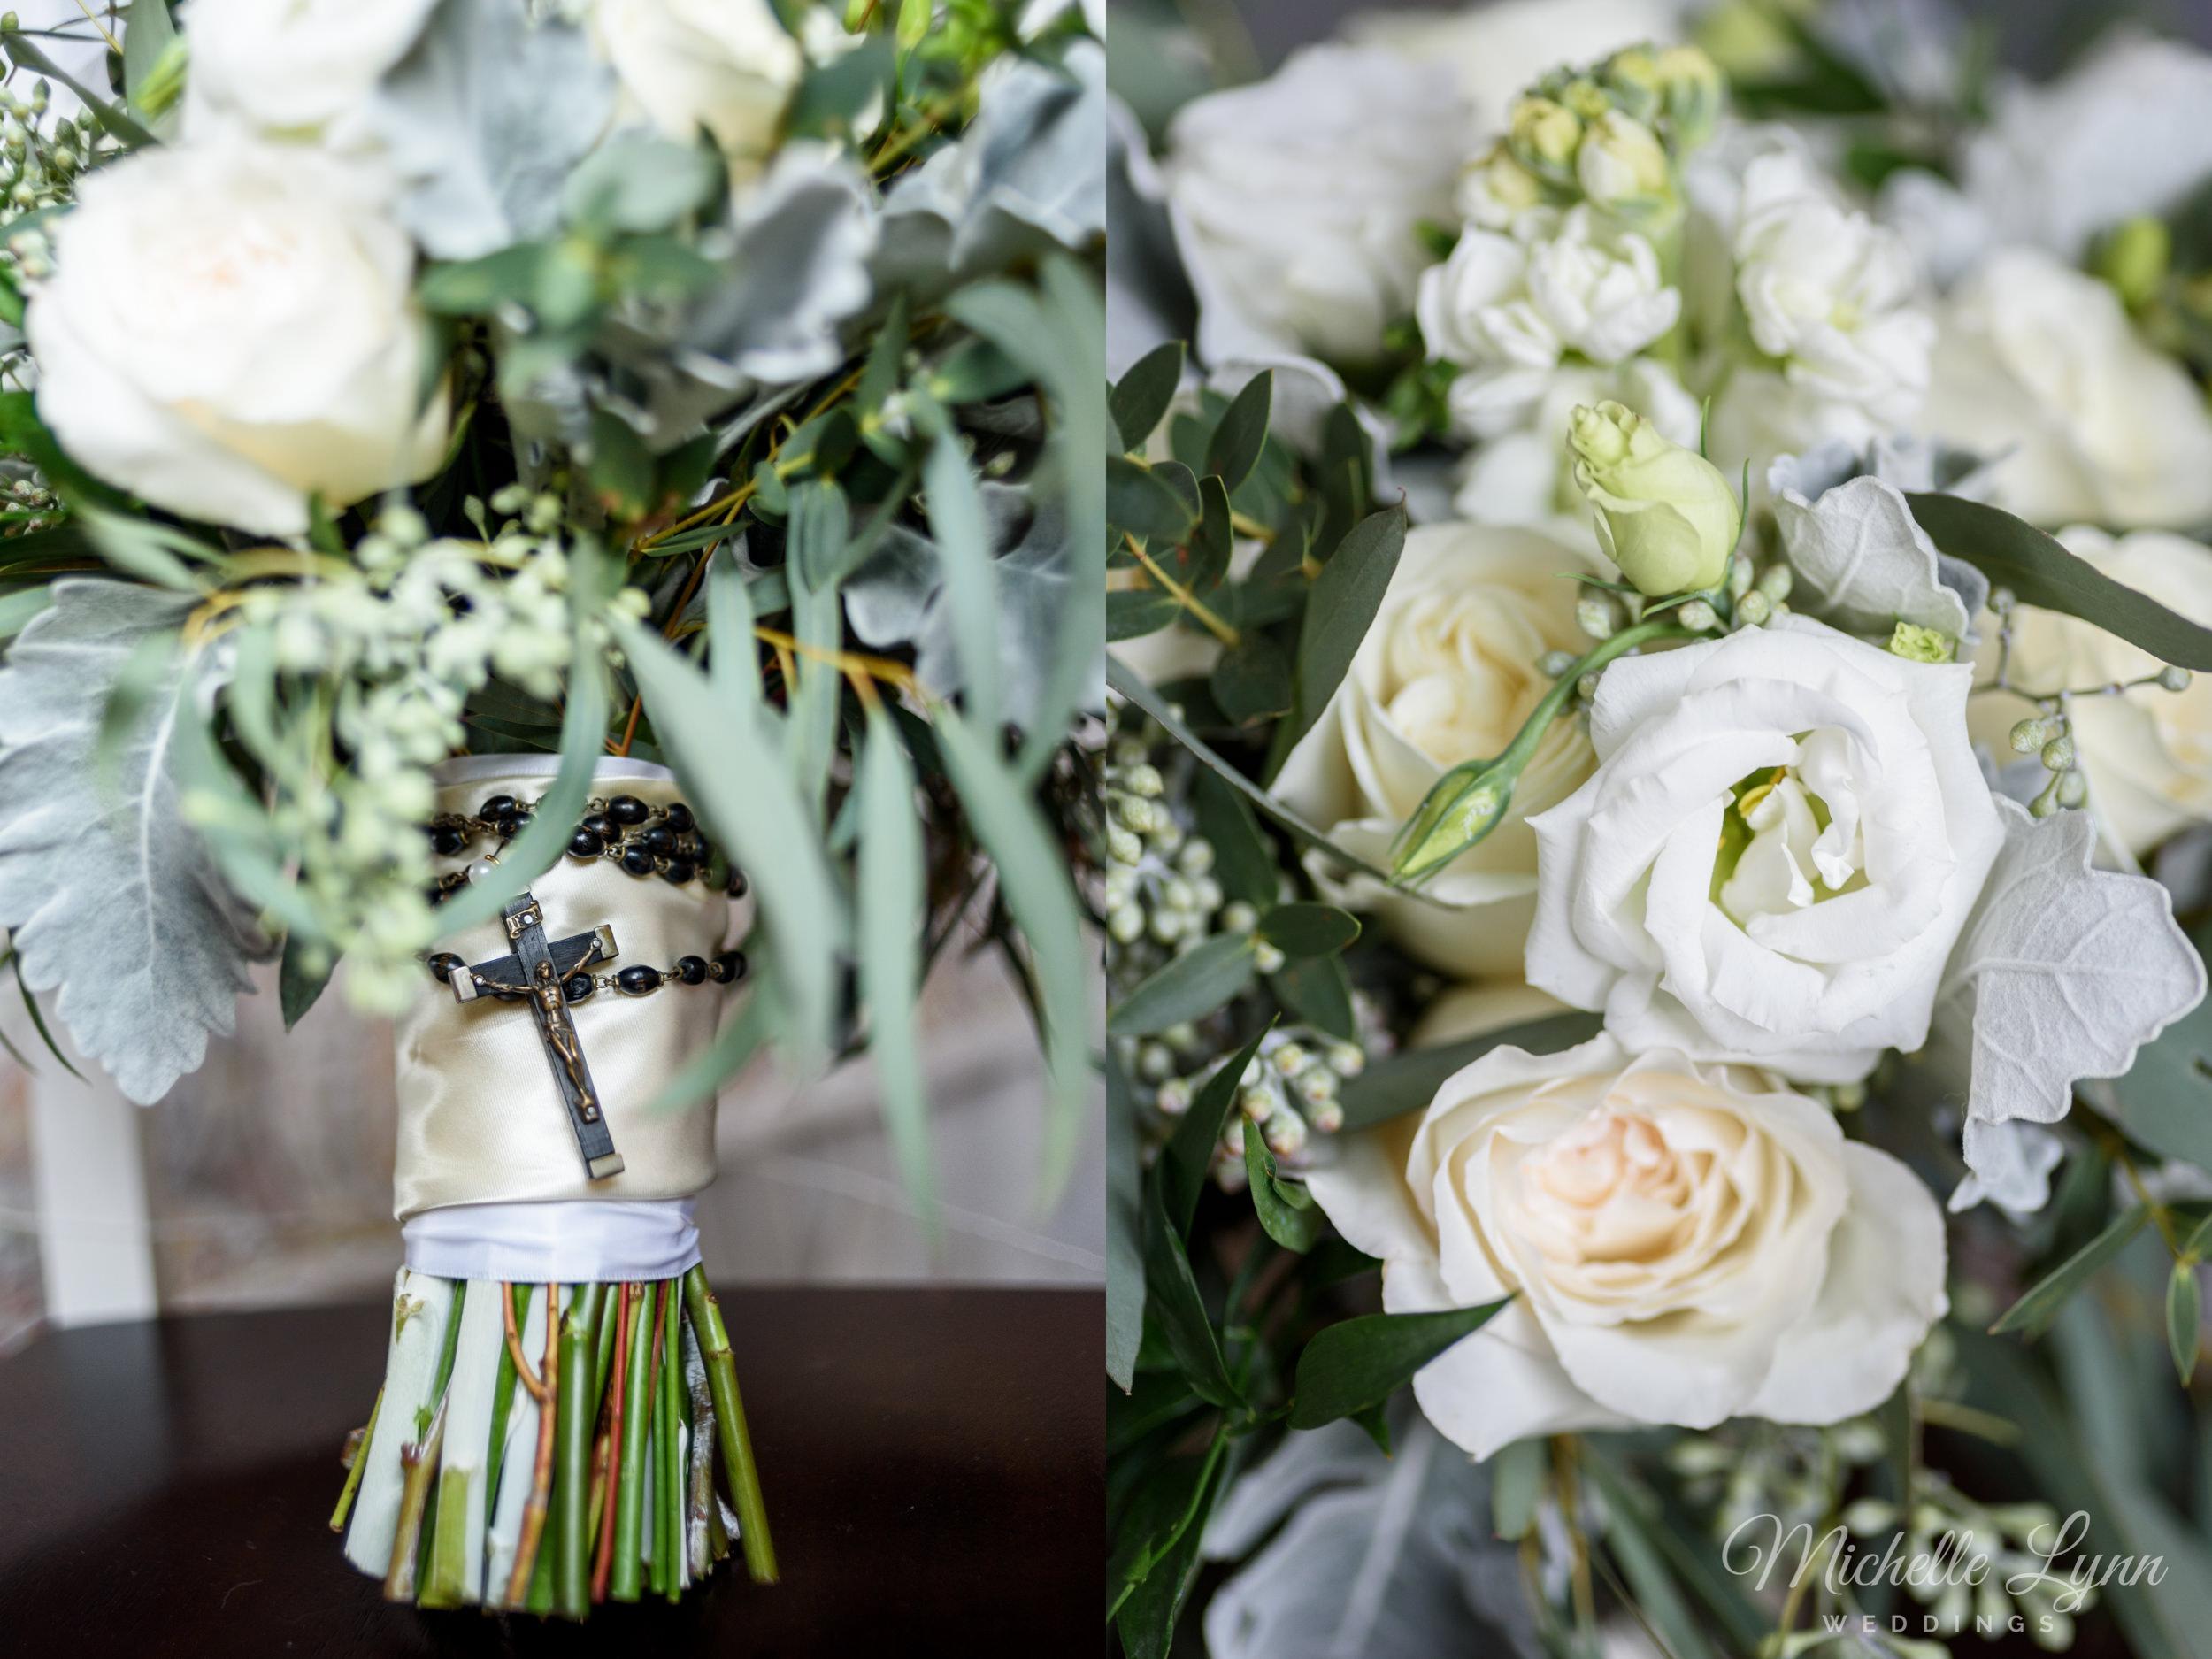 william-penn-inn-wedding-photography-mlw-5.jpg